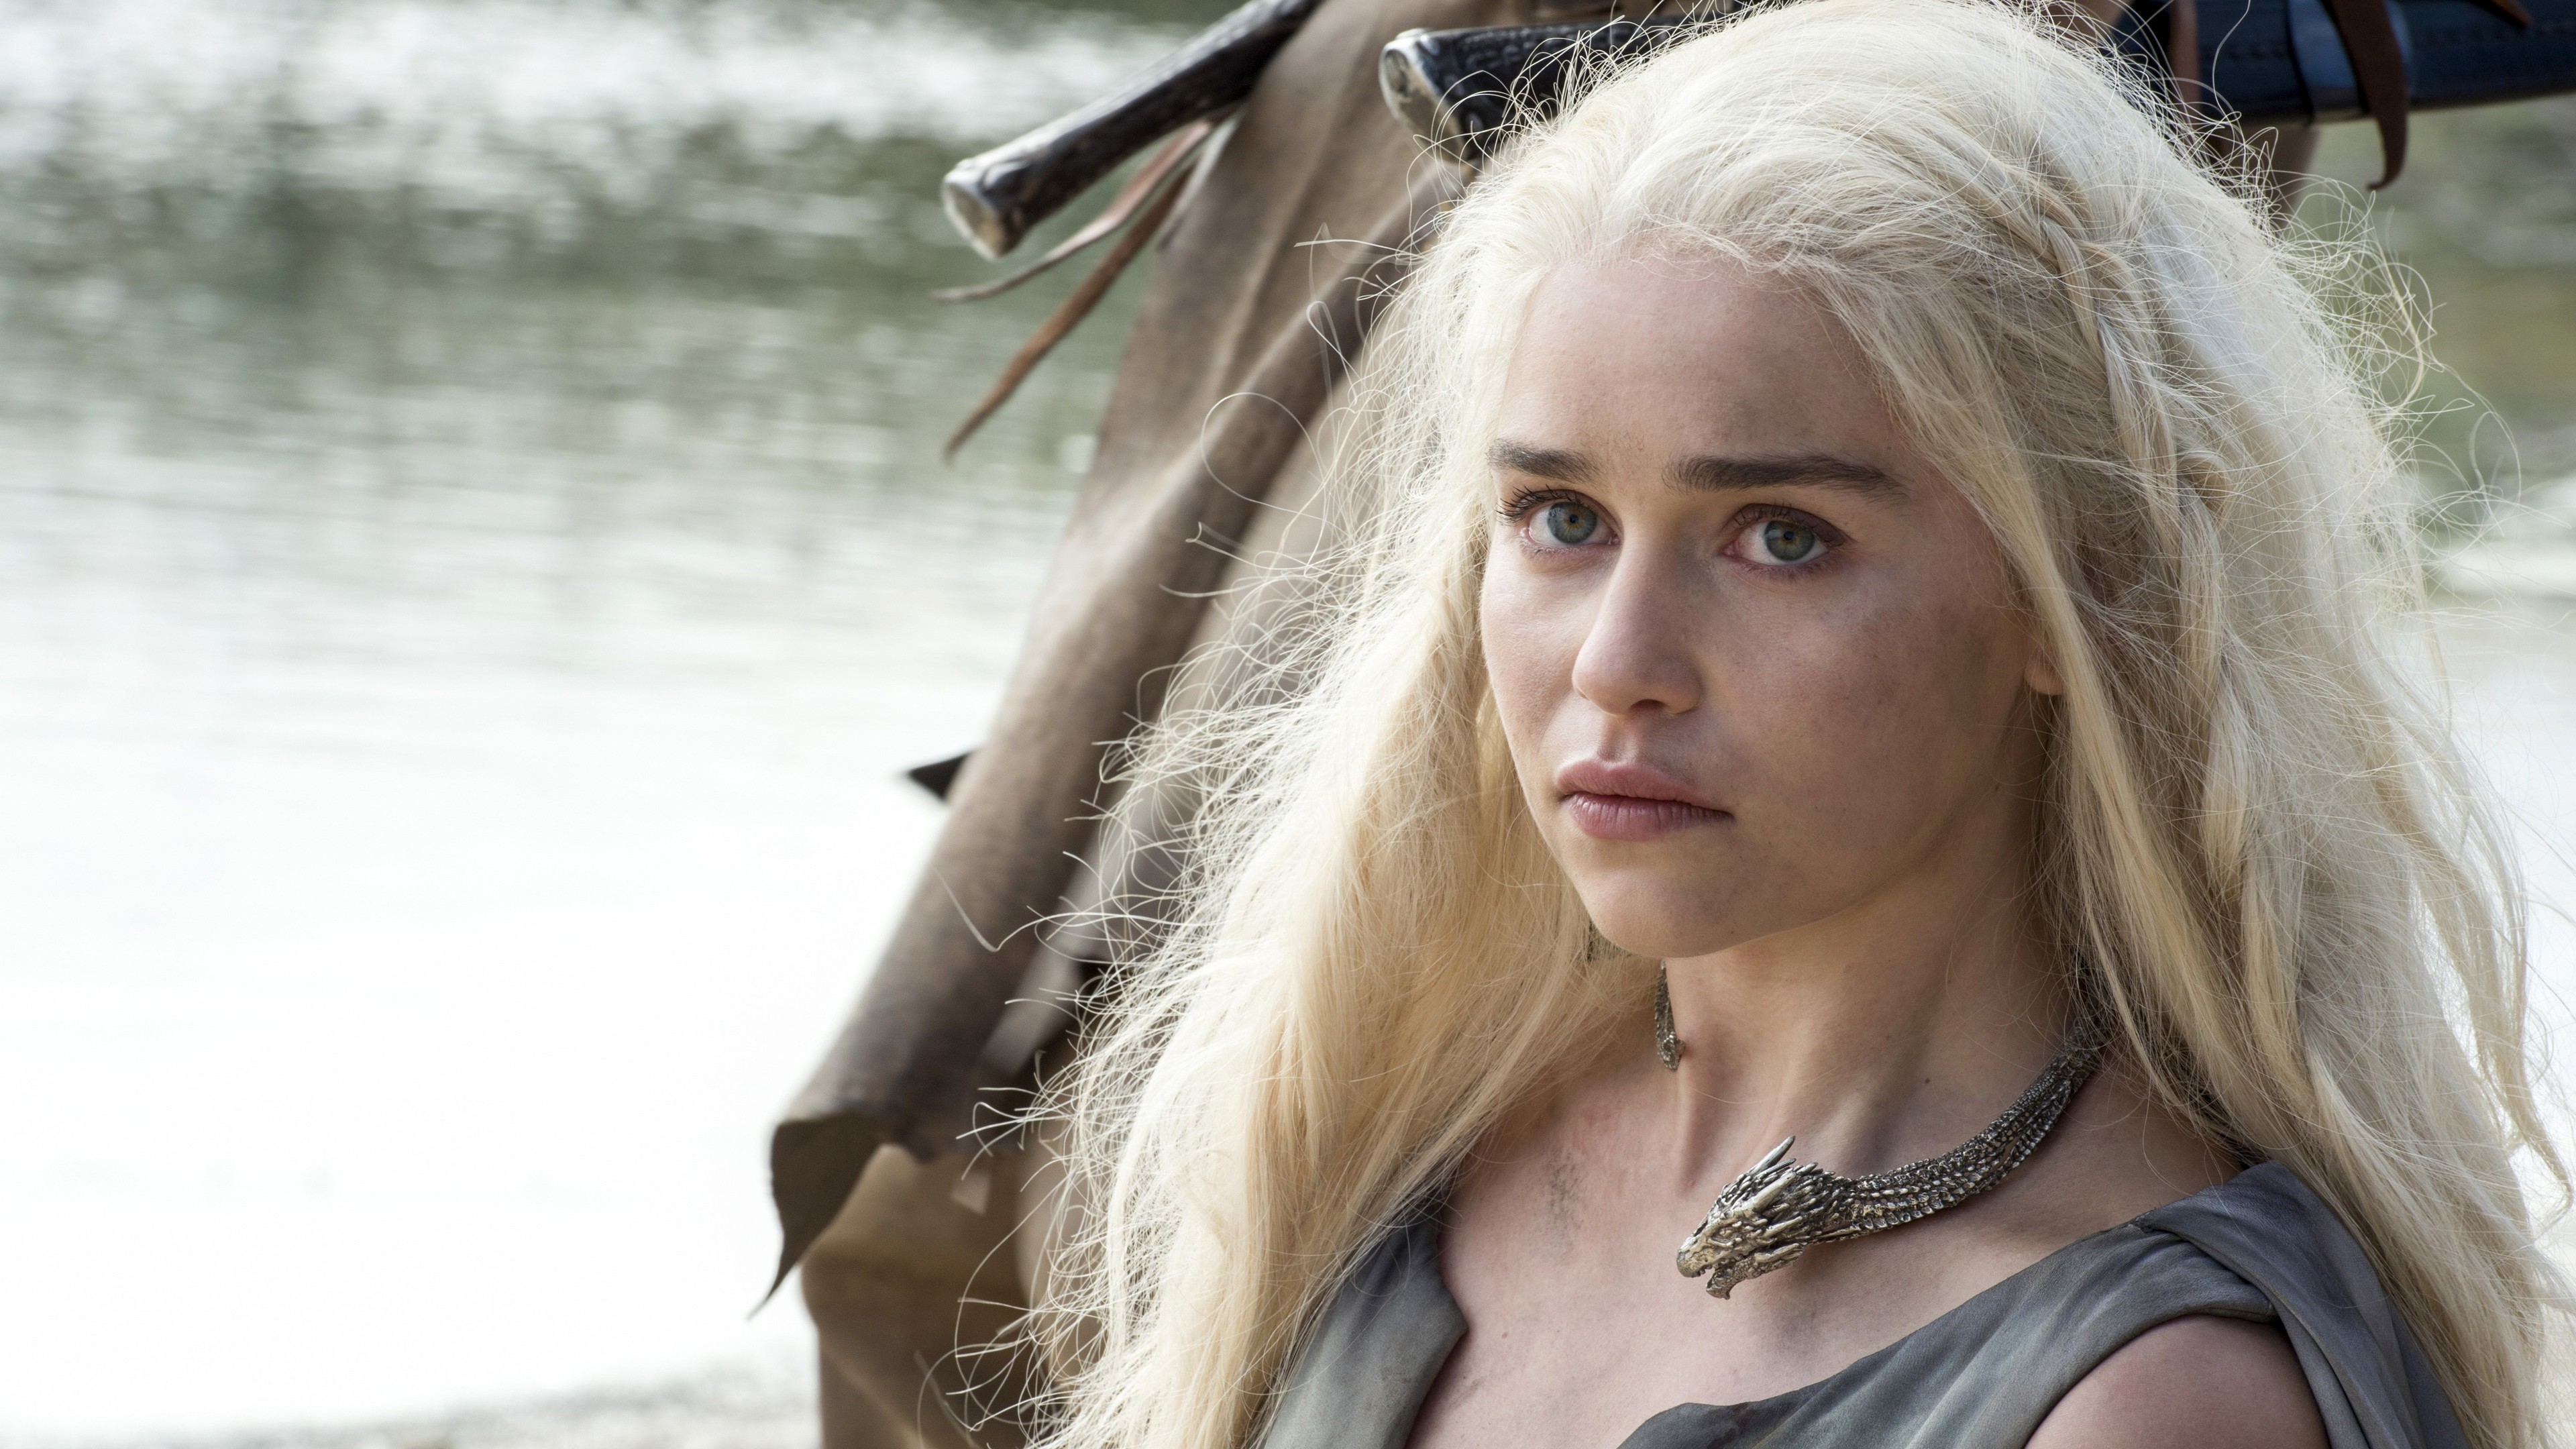 3840x2160 Season 6 Game Of Thrones 4k HD 4k Wallpapers